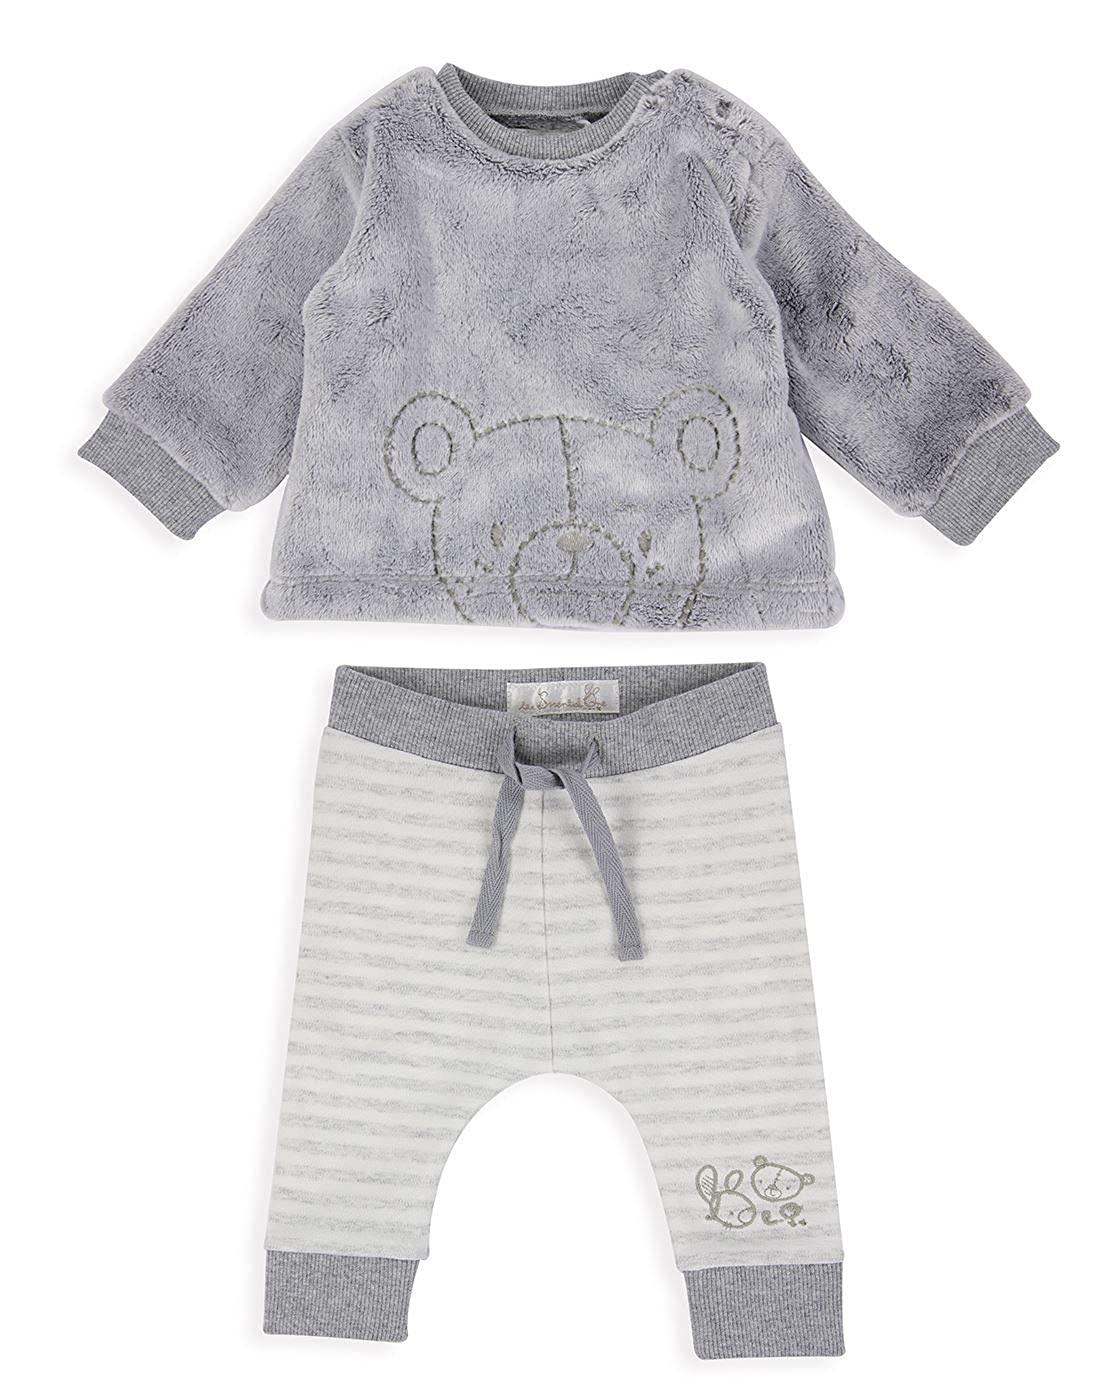 The Essential One - Baby Unisex Bär Hose/Legging & Fleece Top-Set - Grau/Creme - TESS28